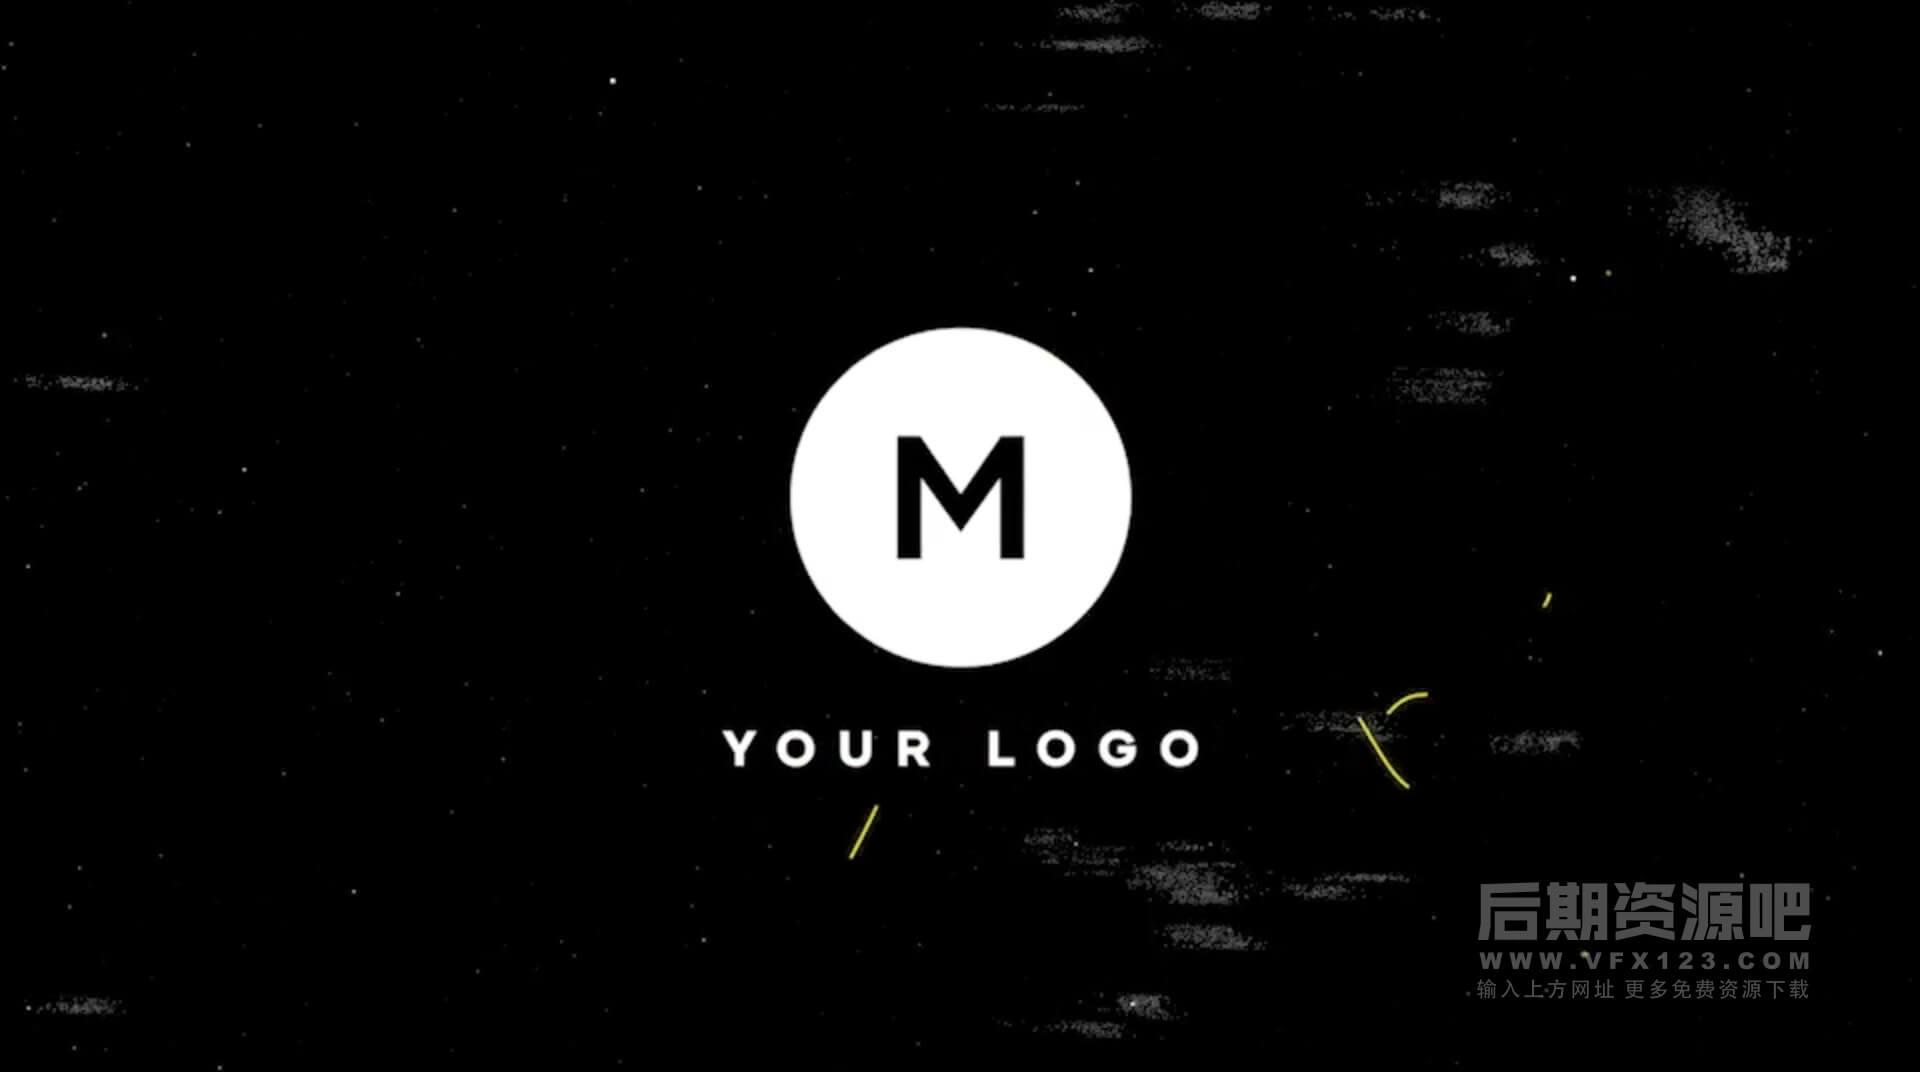 Fcpx主题插件 涂鸦扭曲故障特效LOGO展示模板 Scribble Grunge Logo